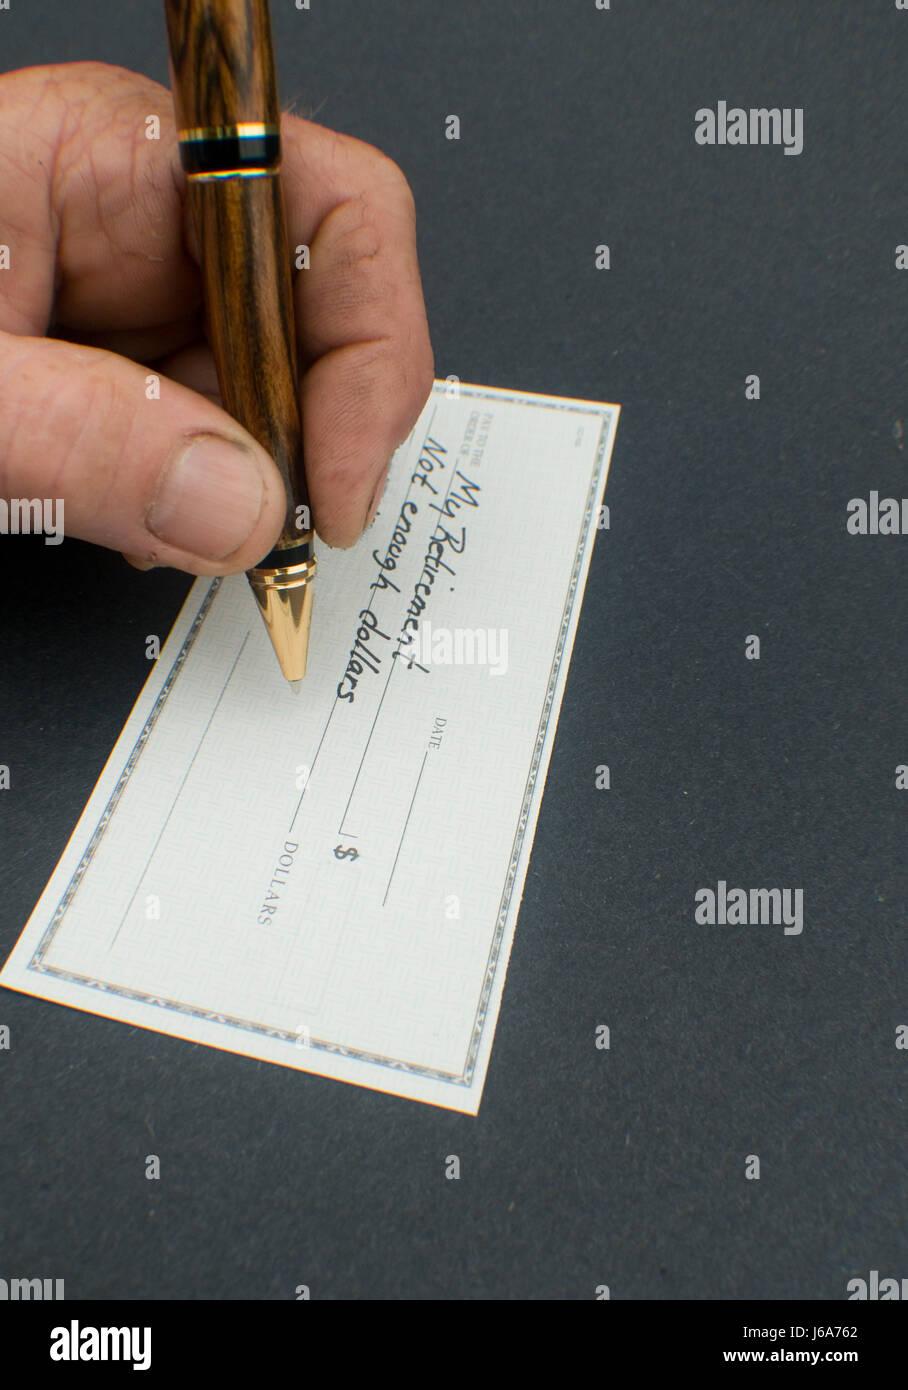 Check Deposit Stock Photos & Check Deposit Stock Images - Alamy